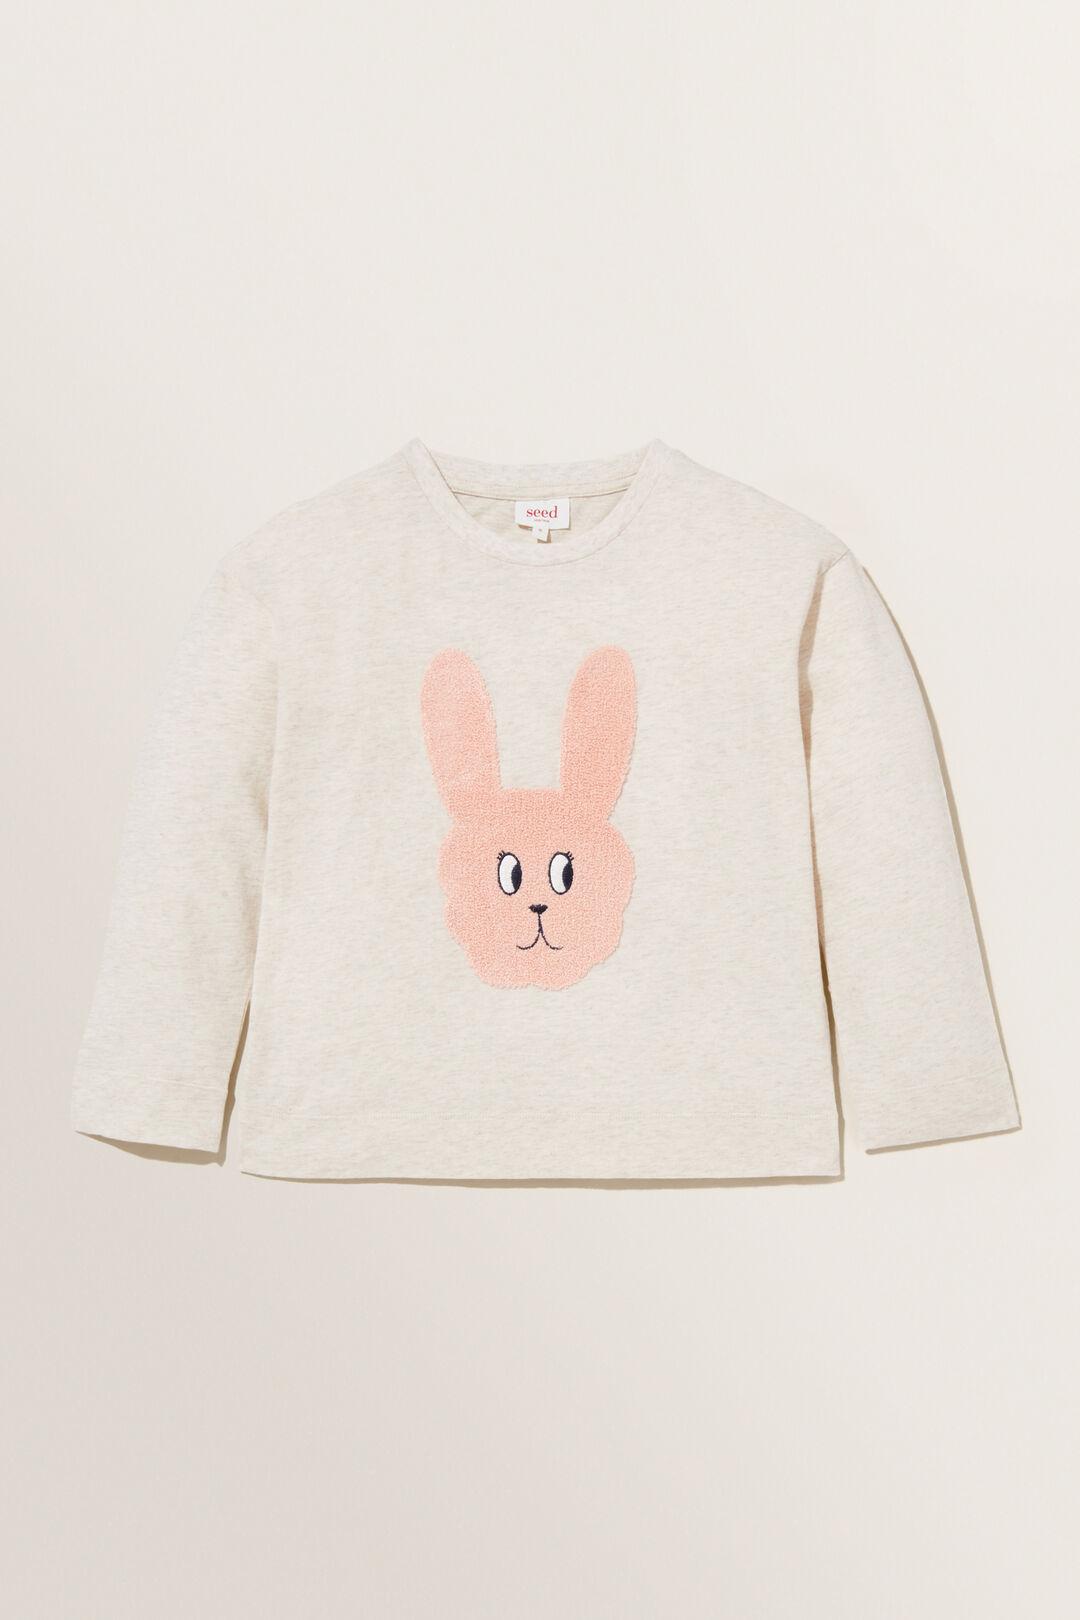 Bunny Face Long Sleeve Tee  OAT MARLE  hi-res